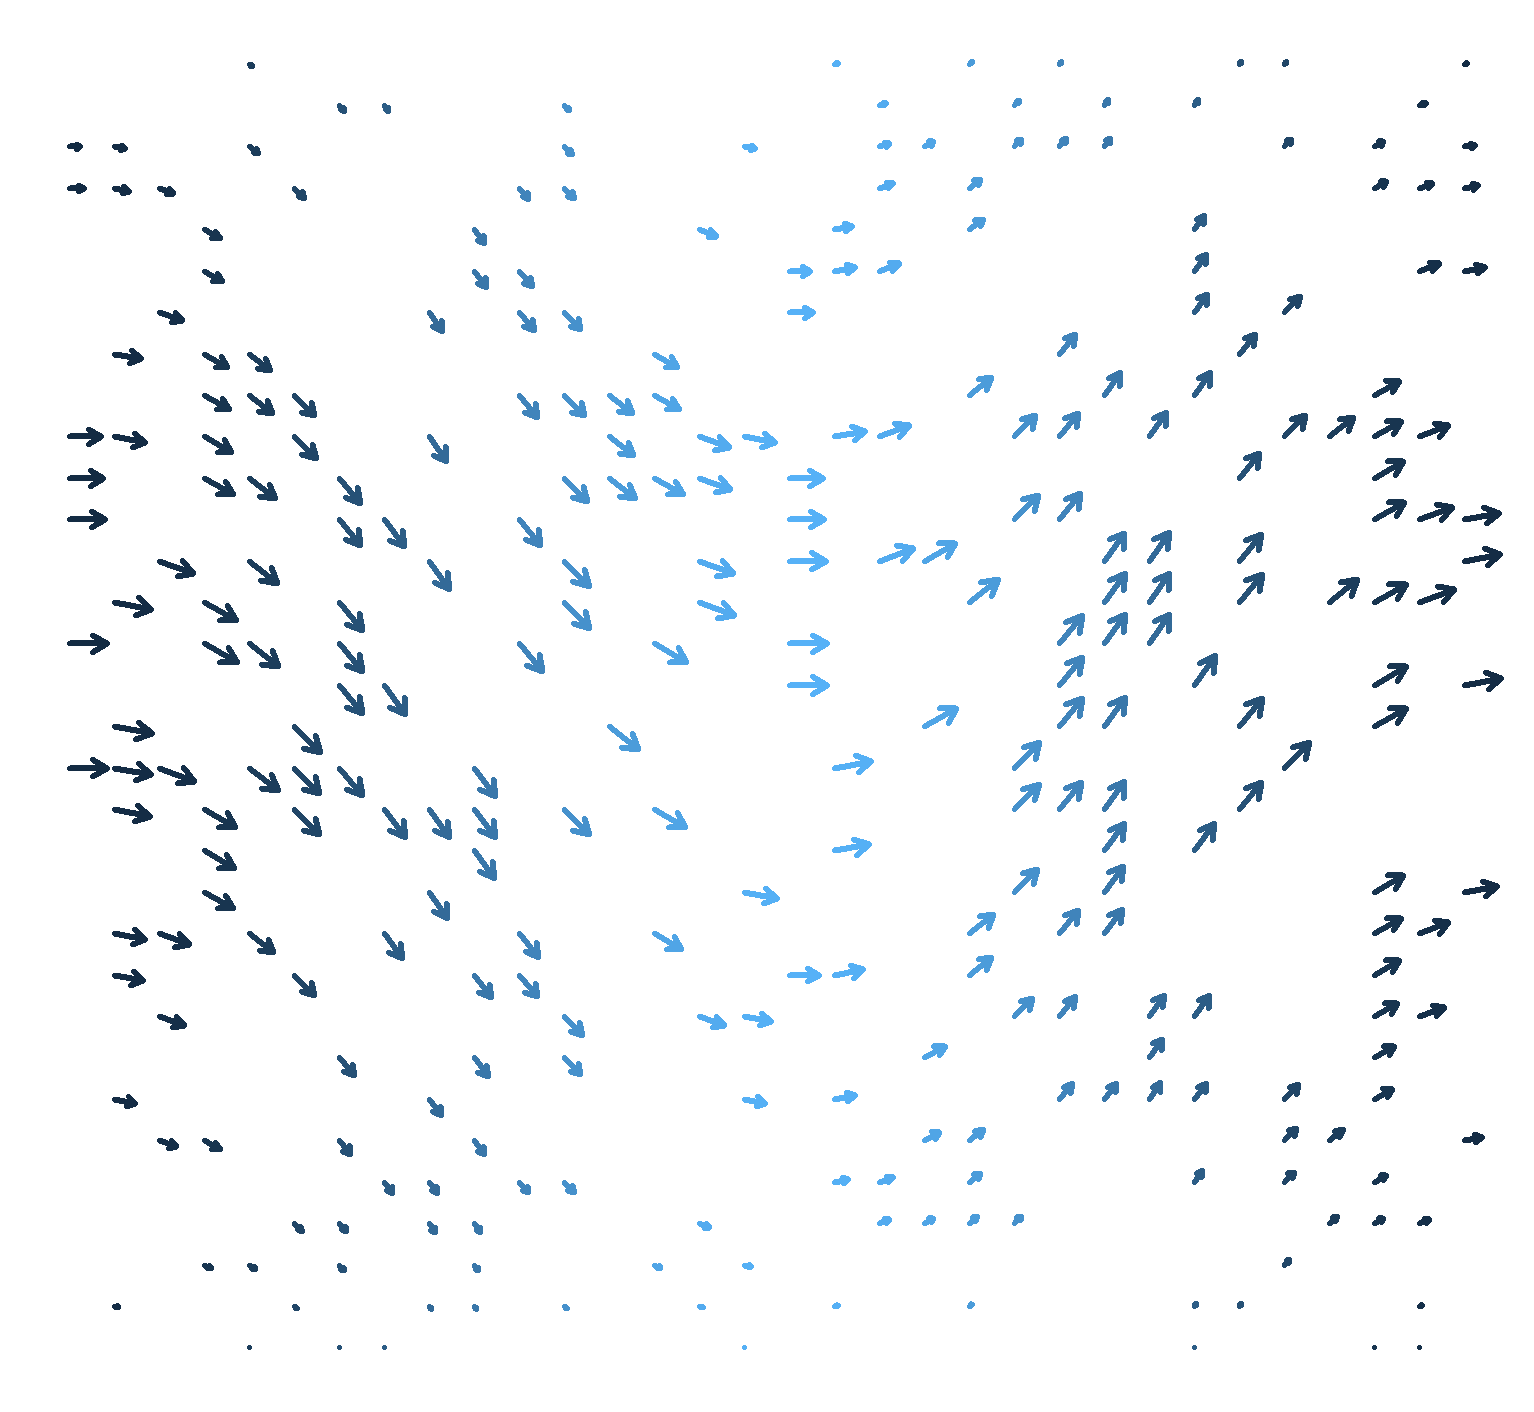 vector_field